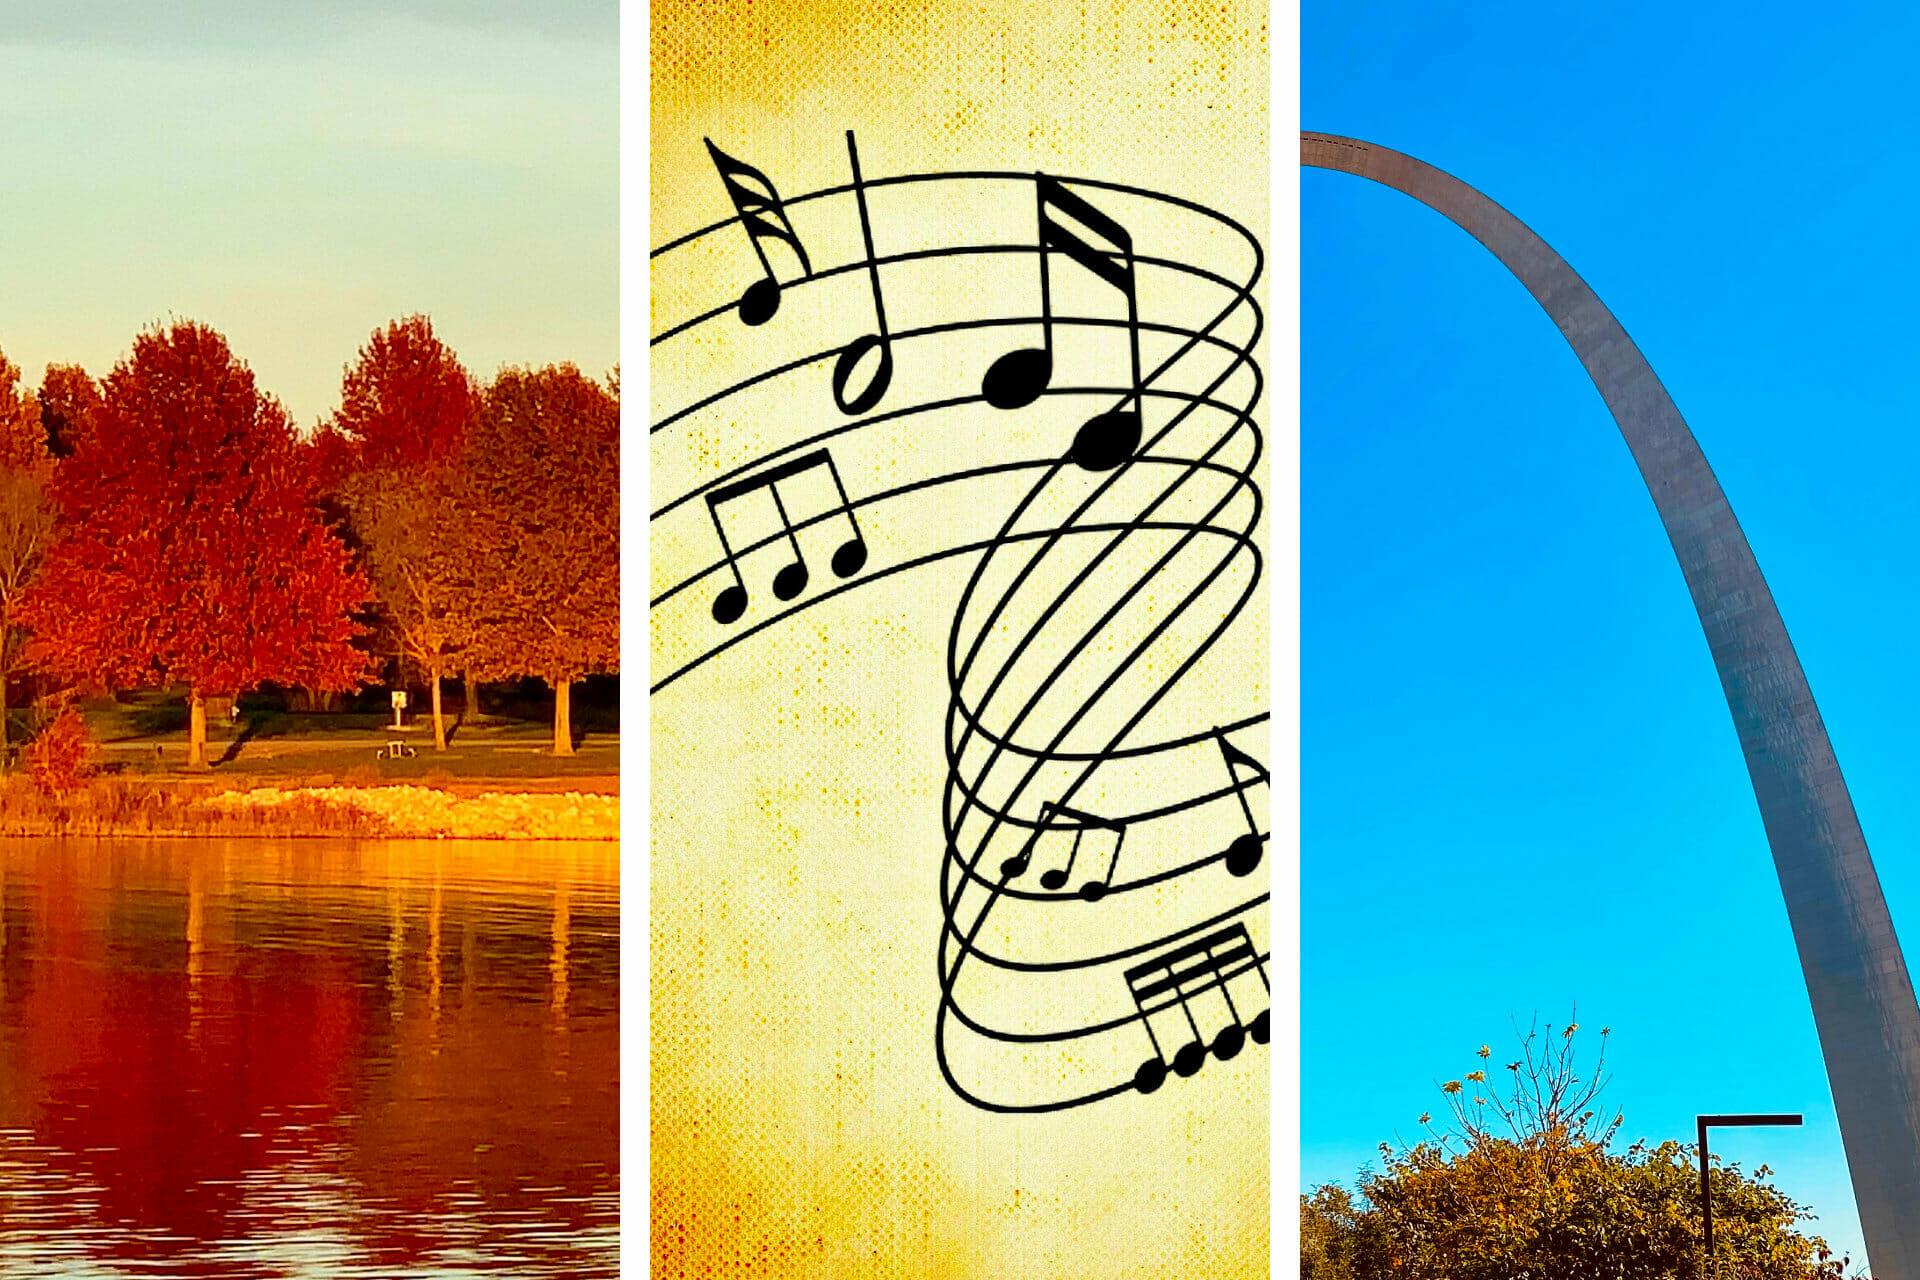 21+ Songs about Missouri to Brighten Your Day via @allamericanatlas